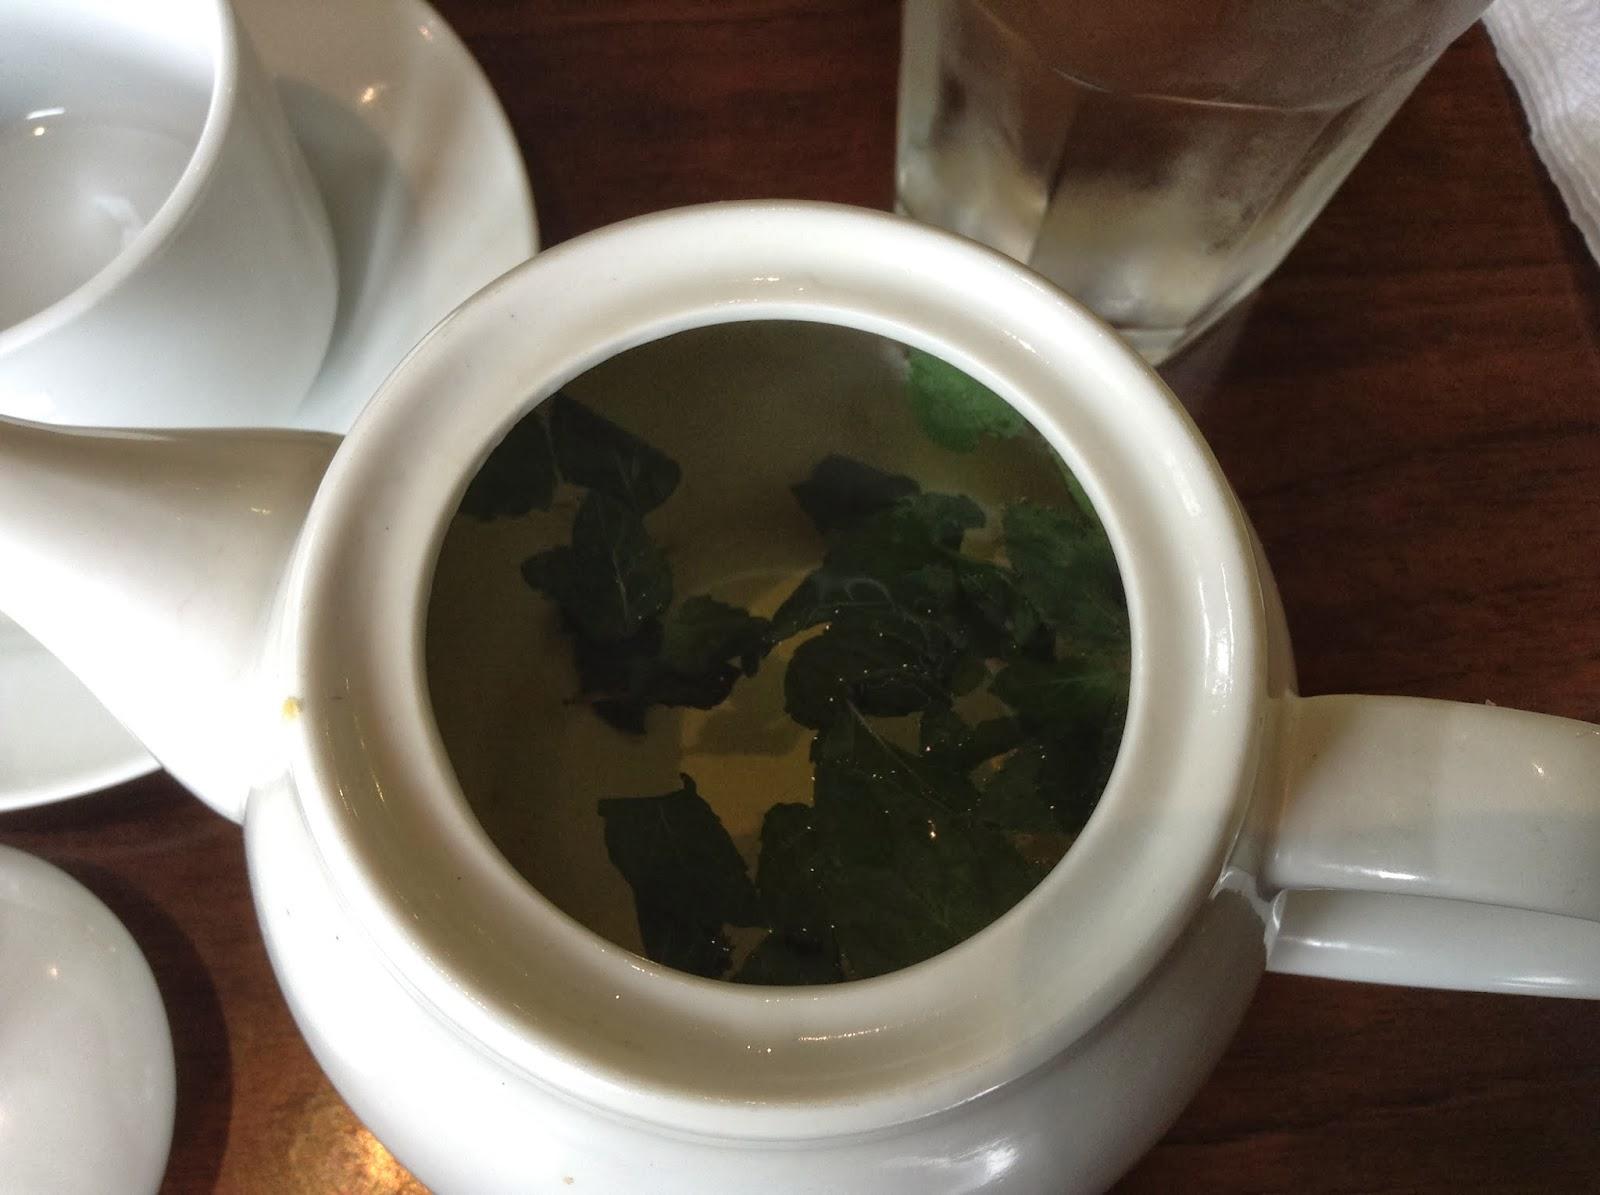 Drinking peppermint tea